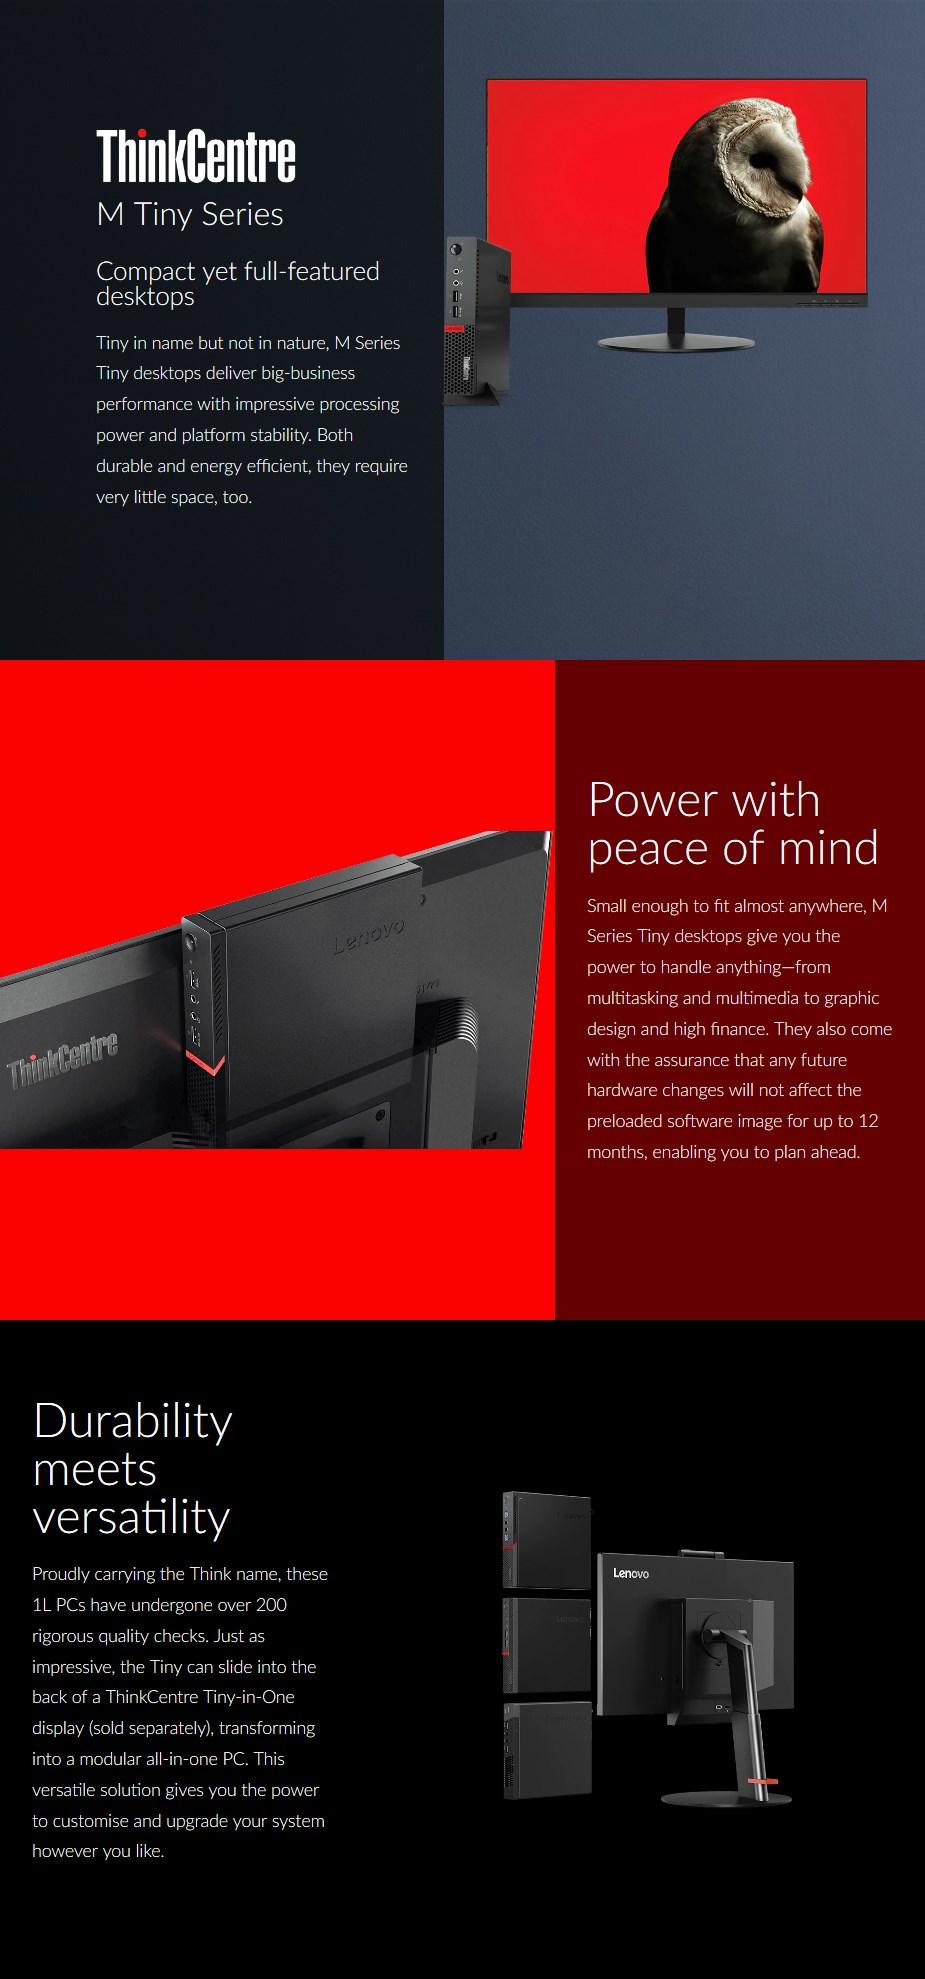 Lenovo ThinkCentre M920 Tiny PC i7-9700T 16GB 512GB WiFi+BT Win10 Pro - Desktop Overview 1